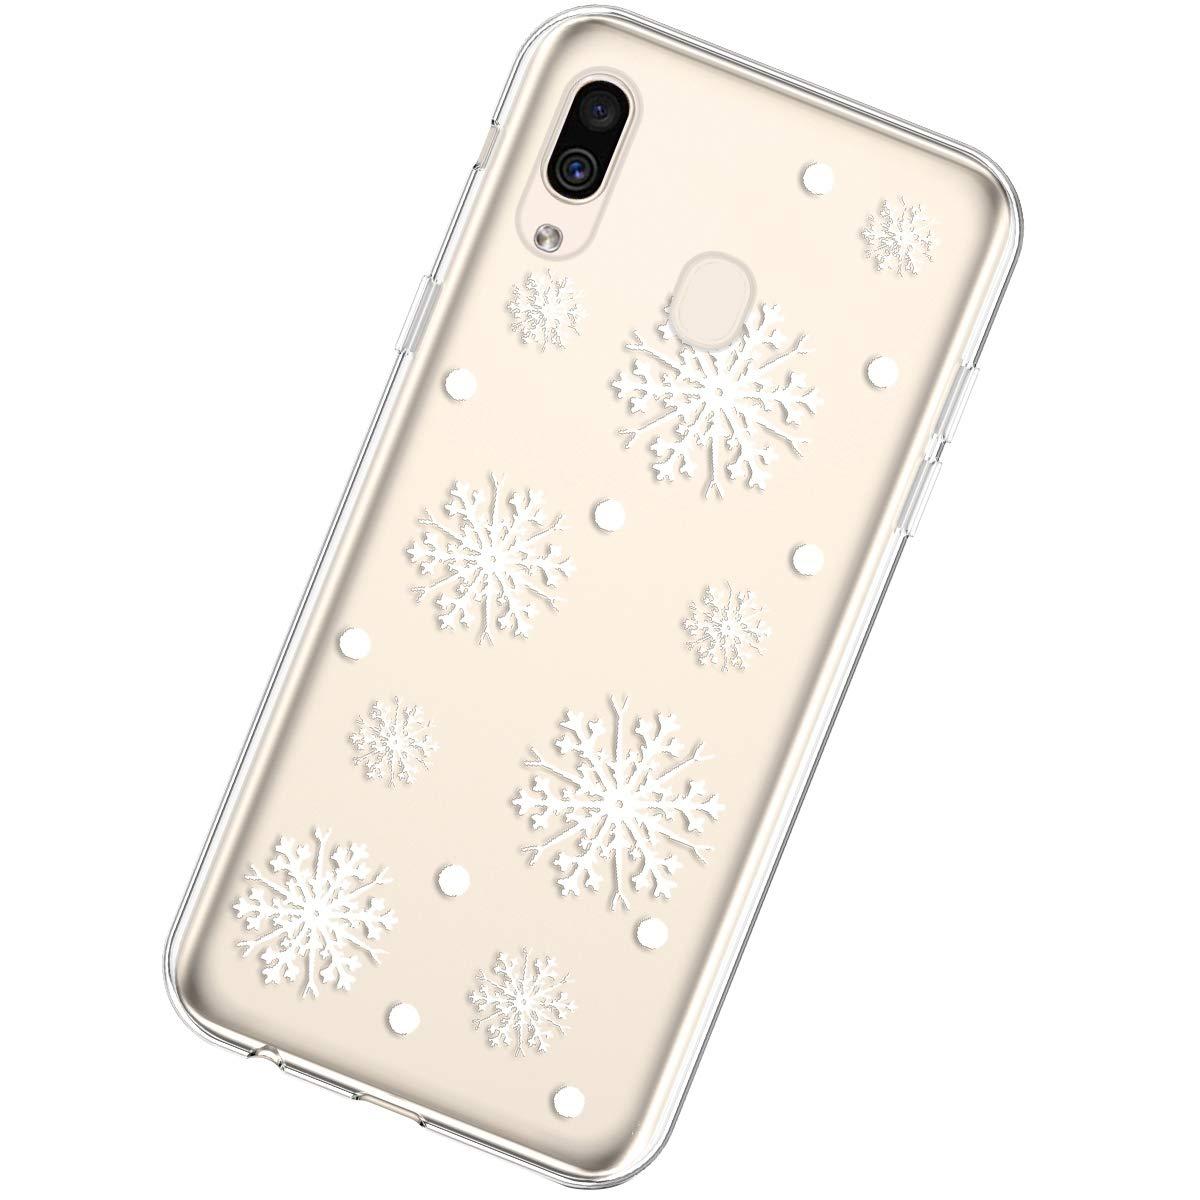 Uposao Kompatibel mit Samsung Galaxy A40 Silikonh/ülle Christmas Durchsichtig Weiche TPU Handytasche Transparent Ultra D/ünn Klar Crystal Clear Bumper Backcover,Weihnachten Haustier